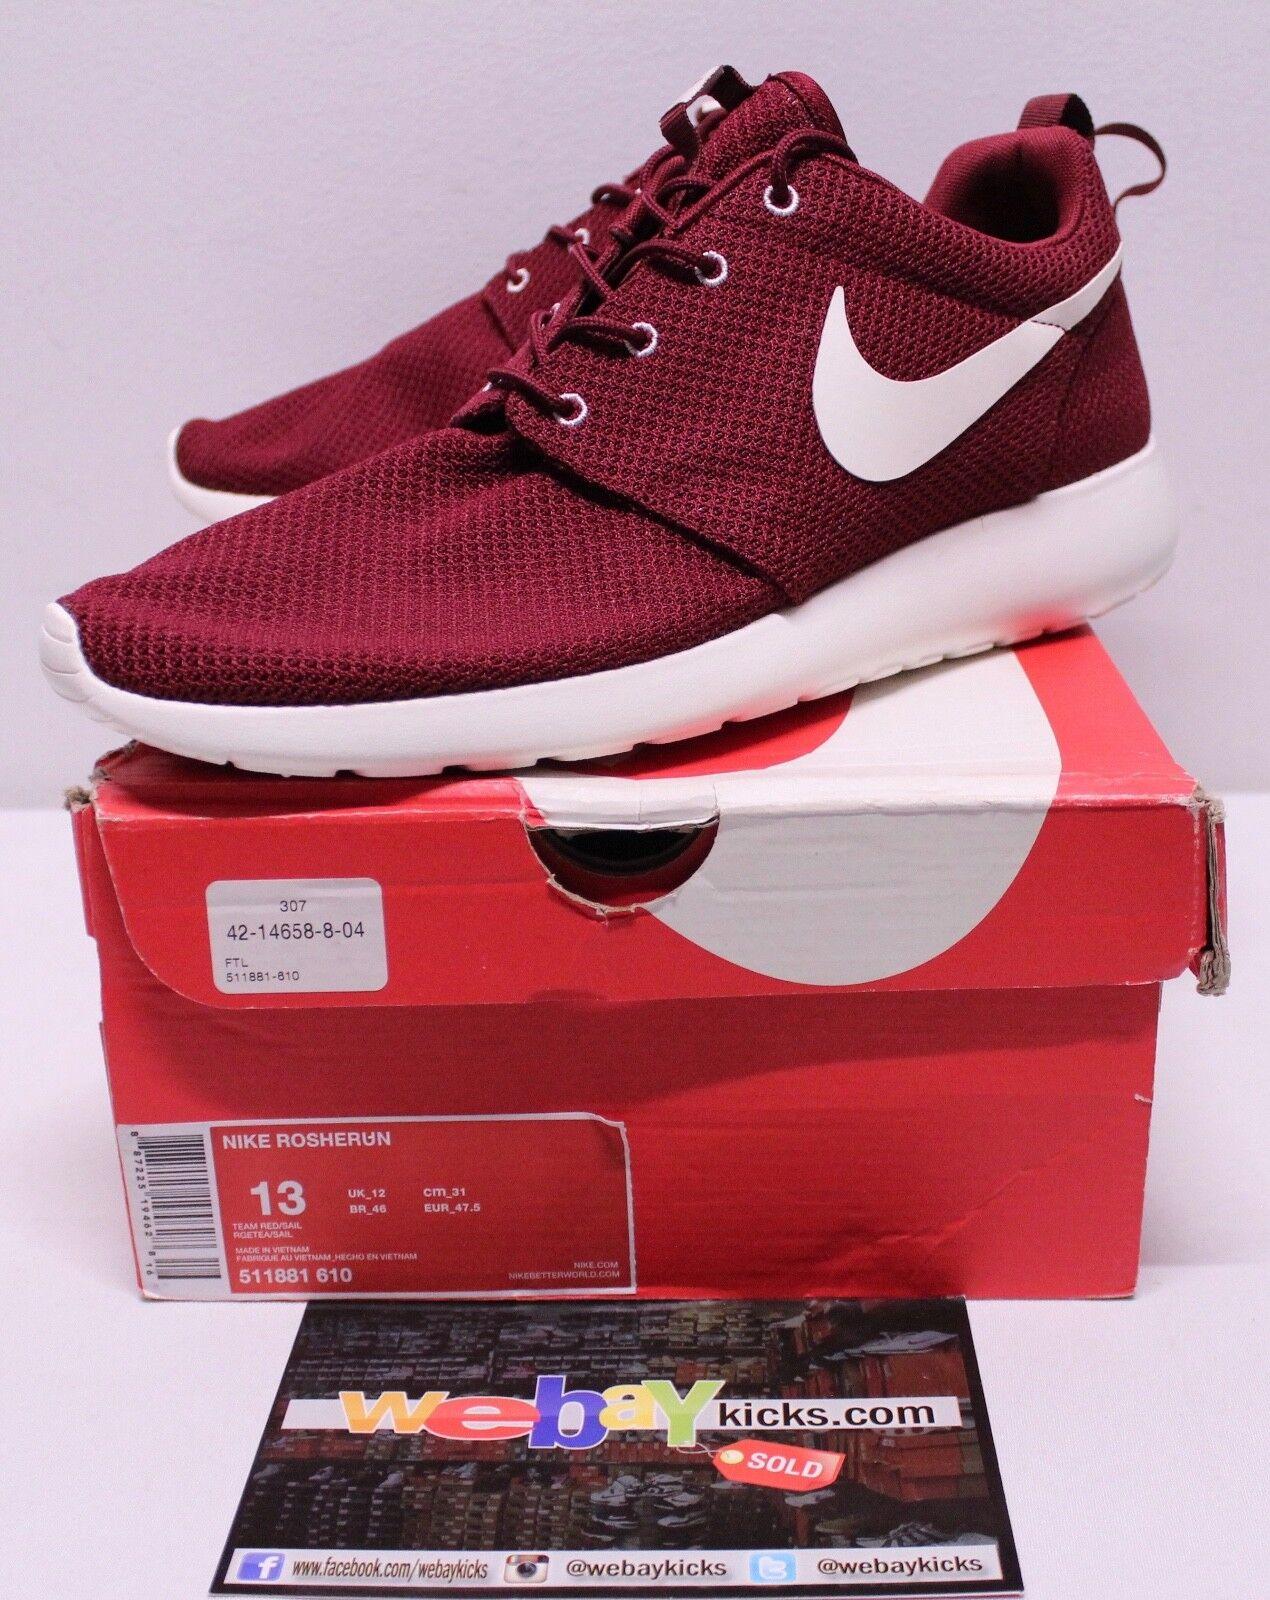 Nike Air Roshe Run one og equipo de vino rojo comodo blanco zapatillas hombres es comodo rojo precio de temporada corta, beneficios de descuentos 4e1d29